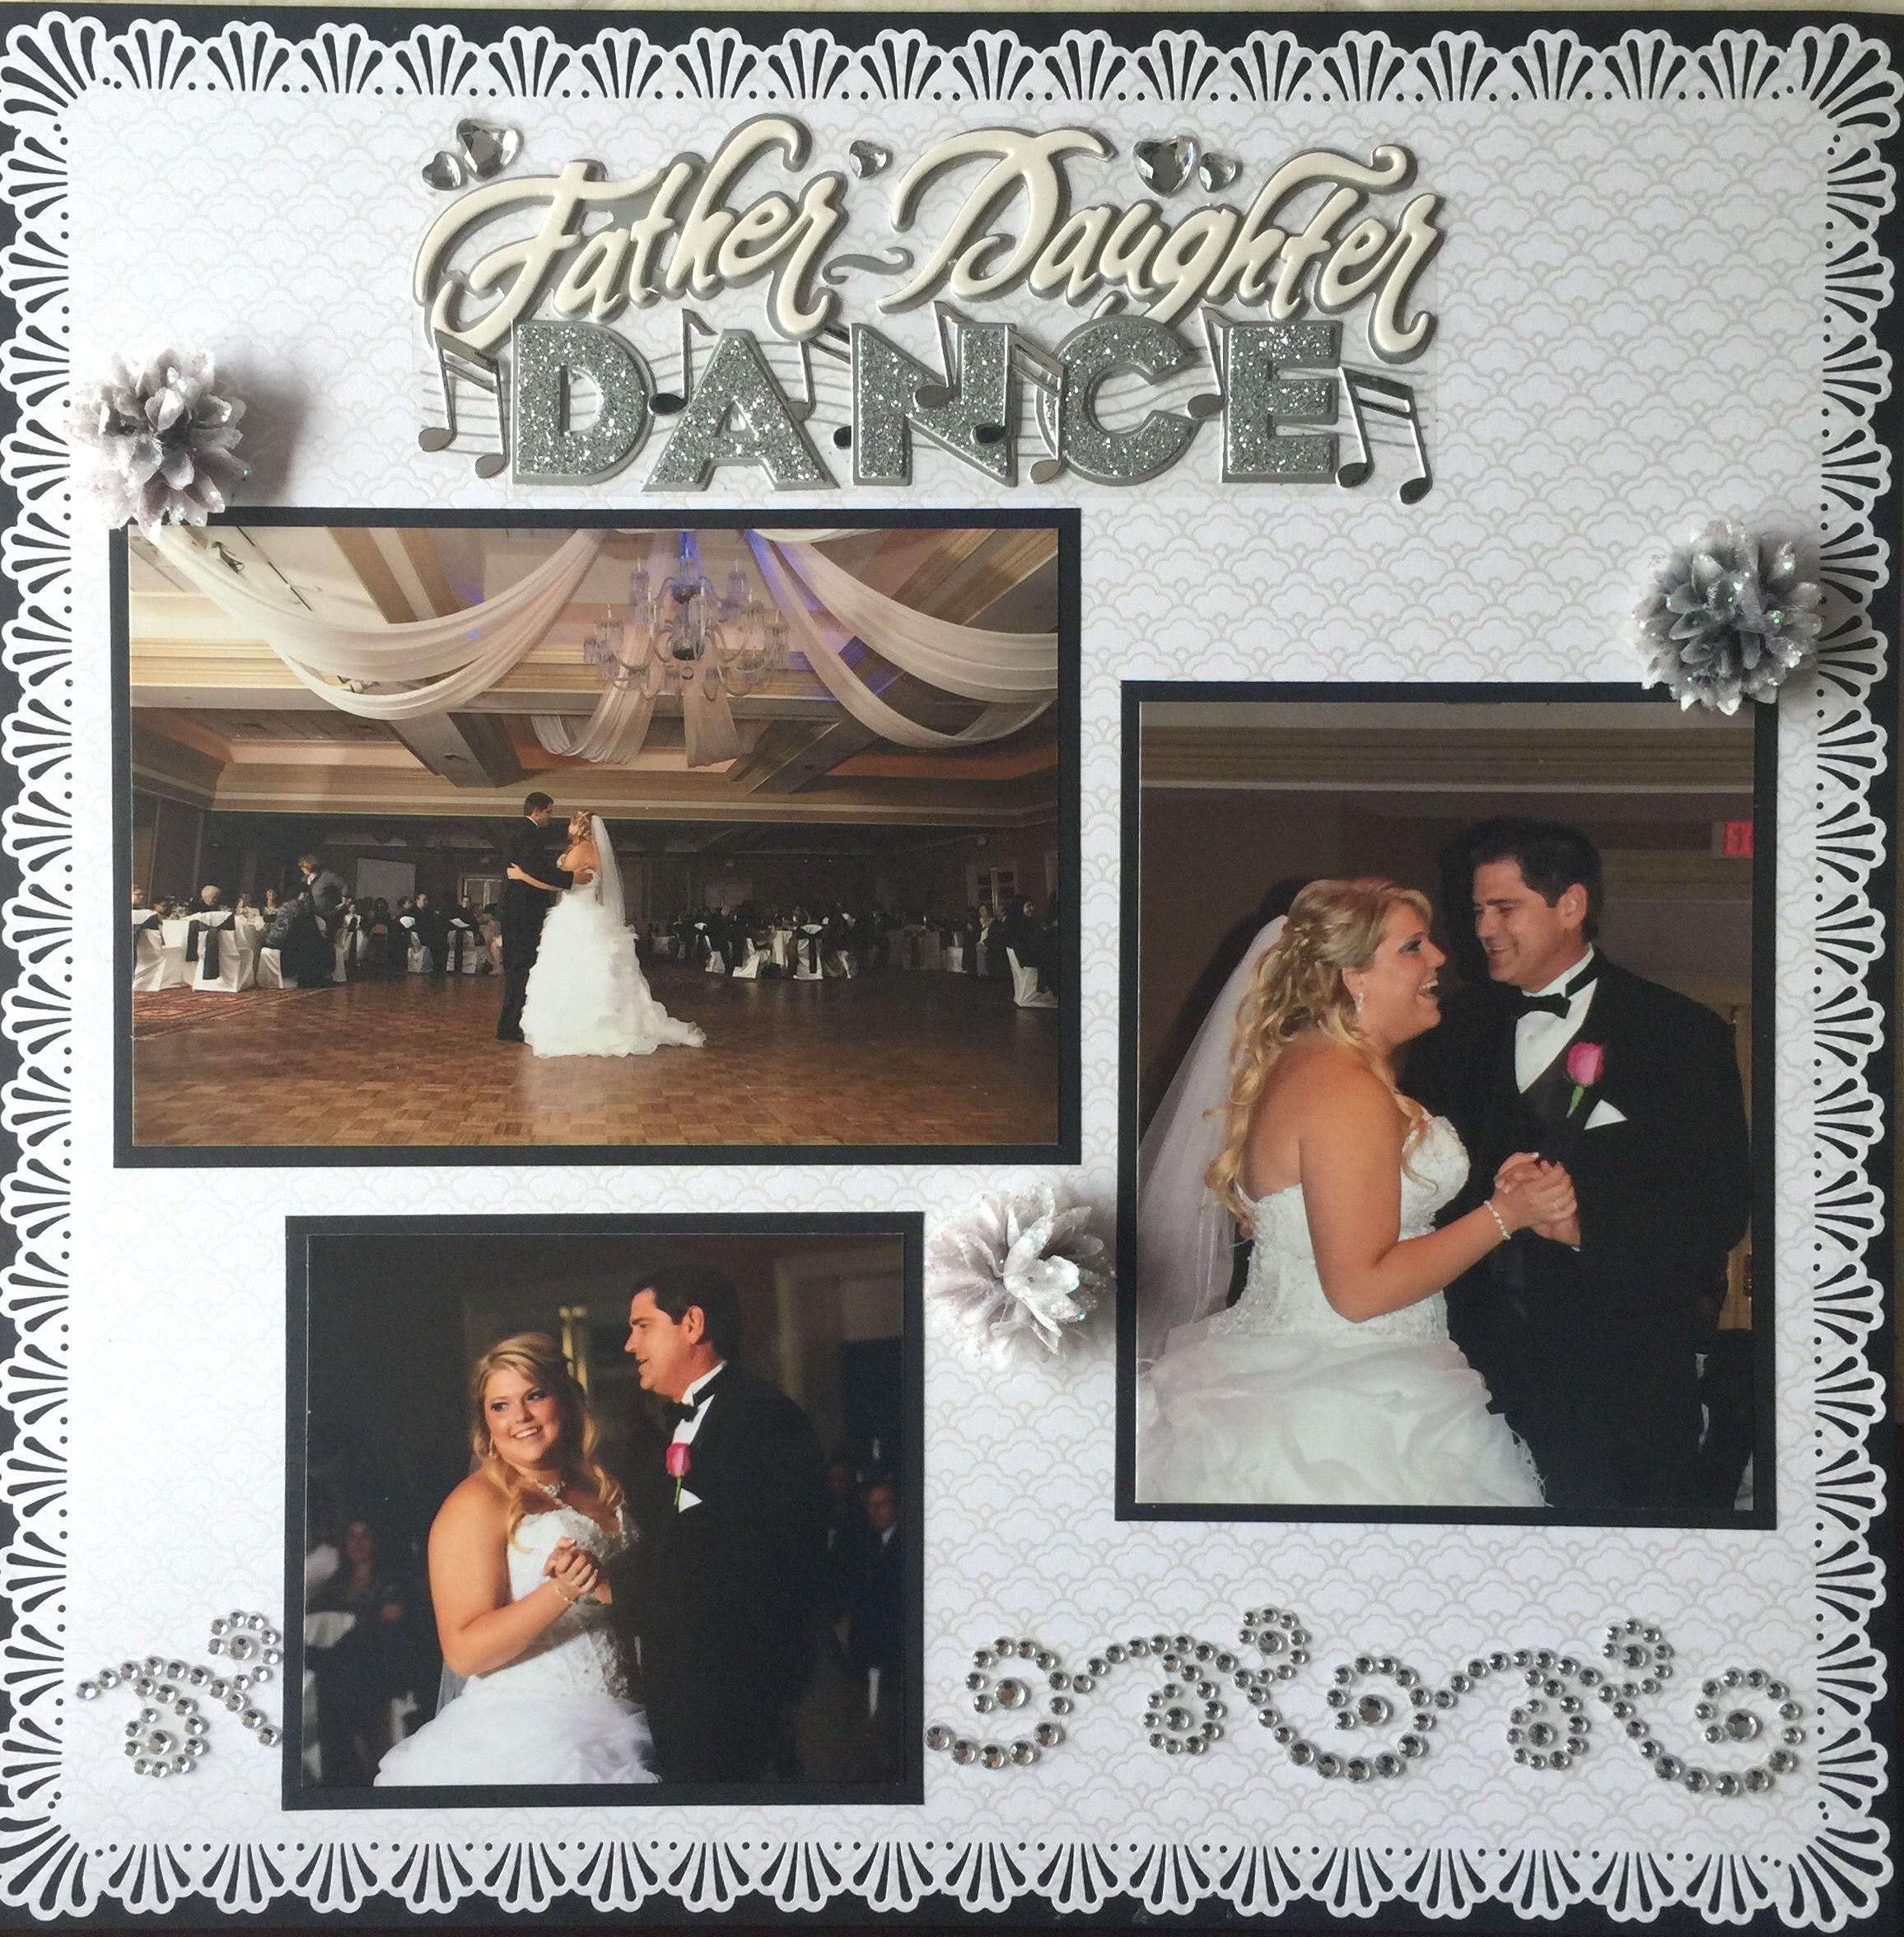 FatherDaughter Dance Wedding scrapbook